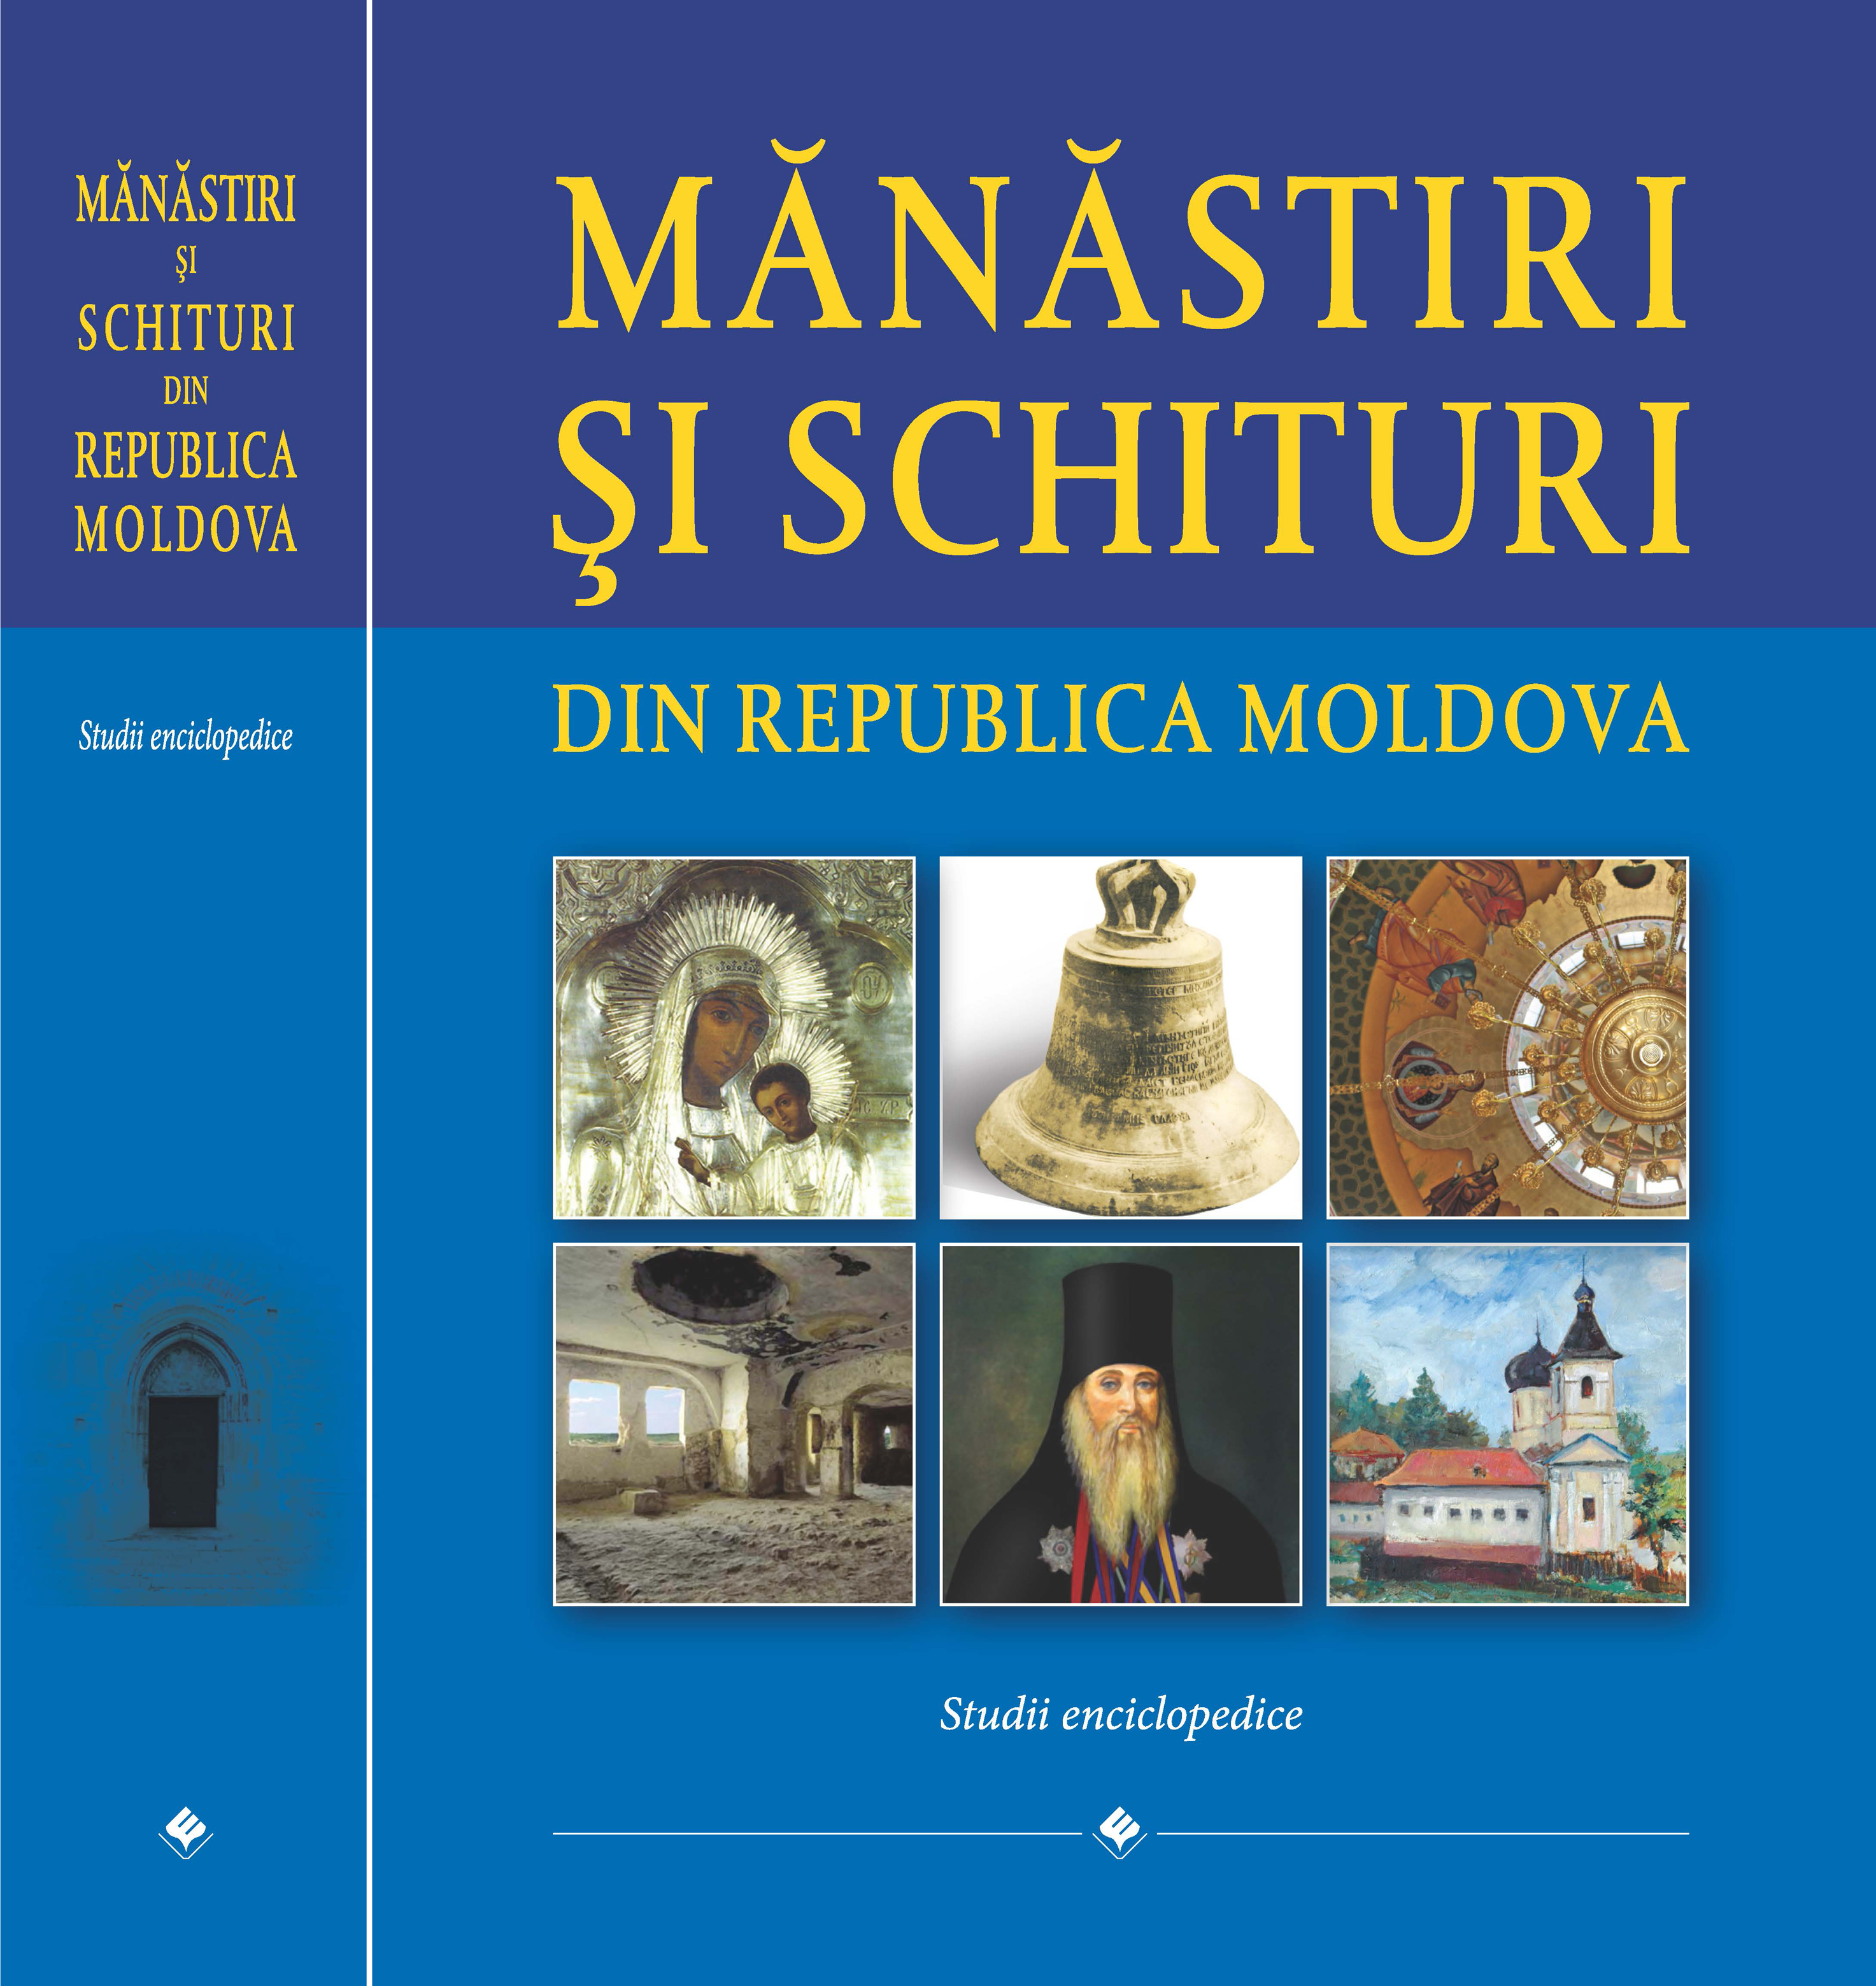 manastiri_2013